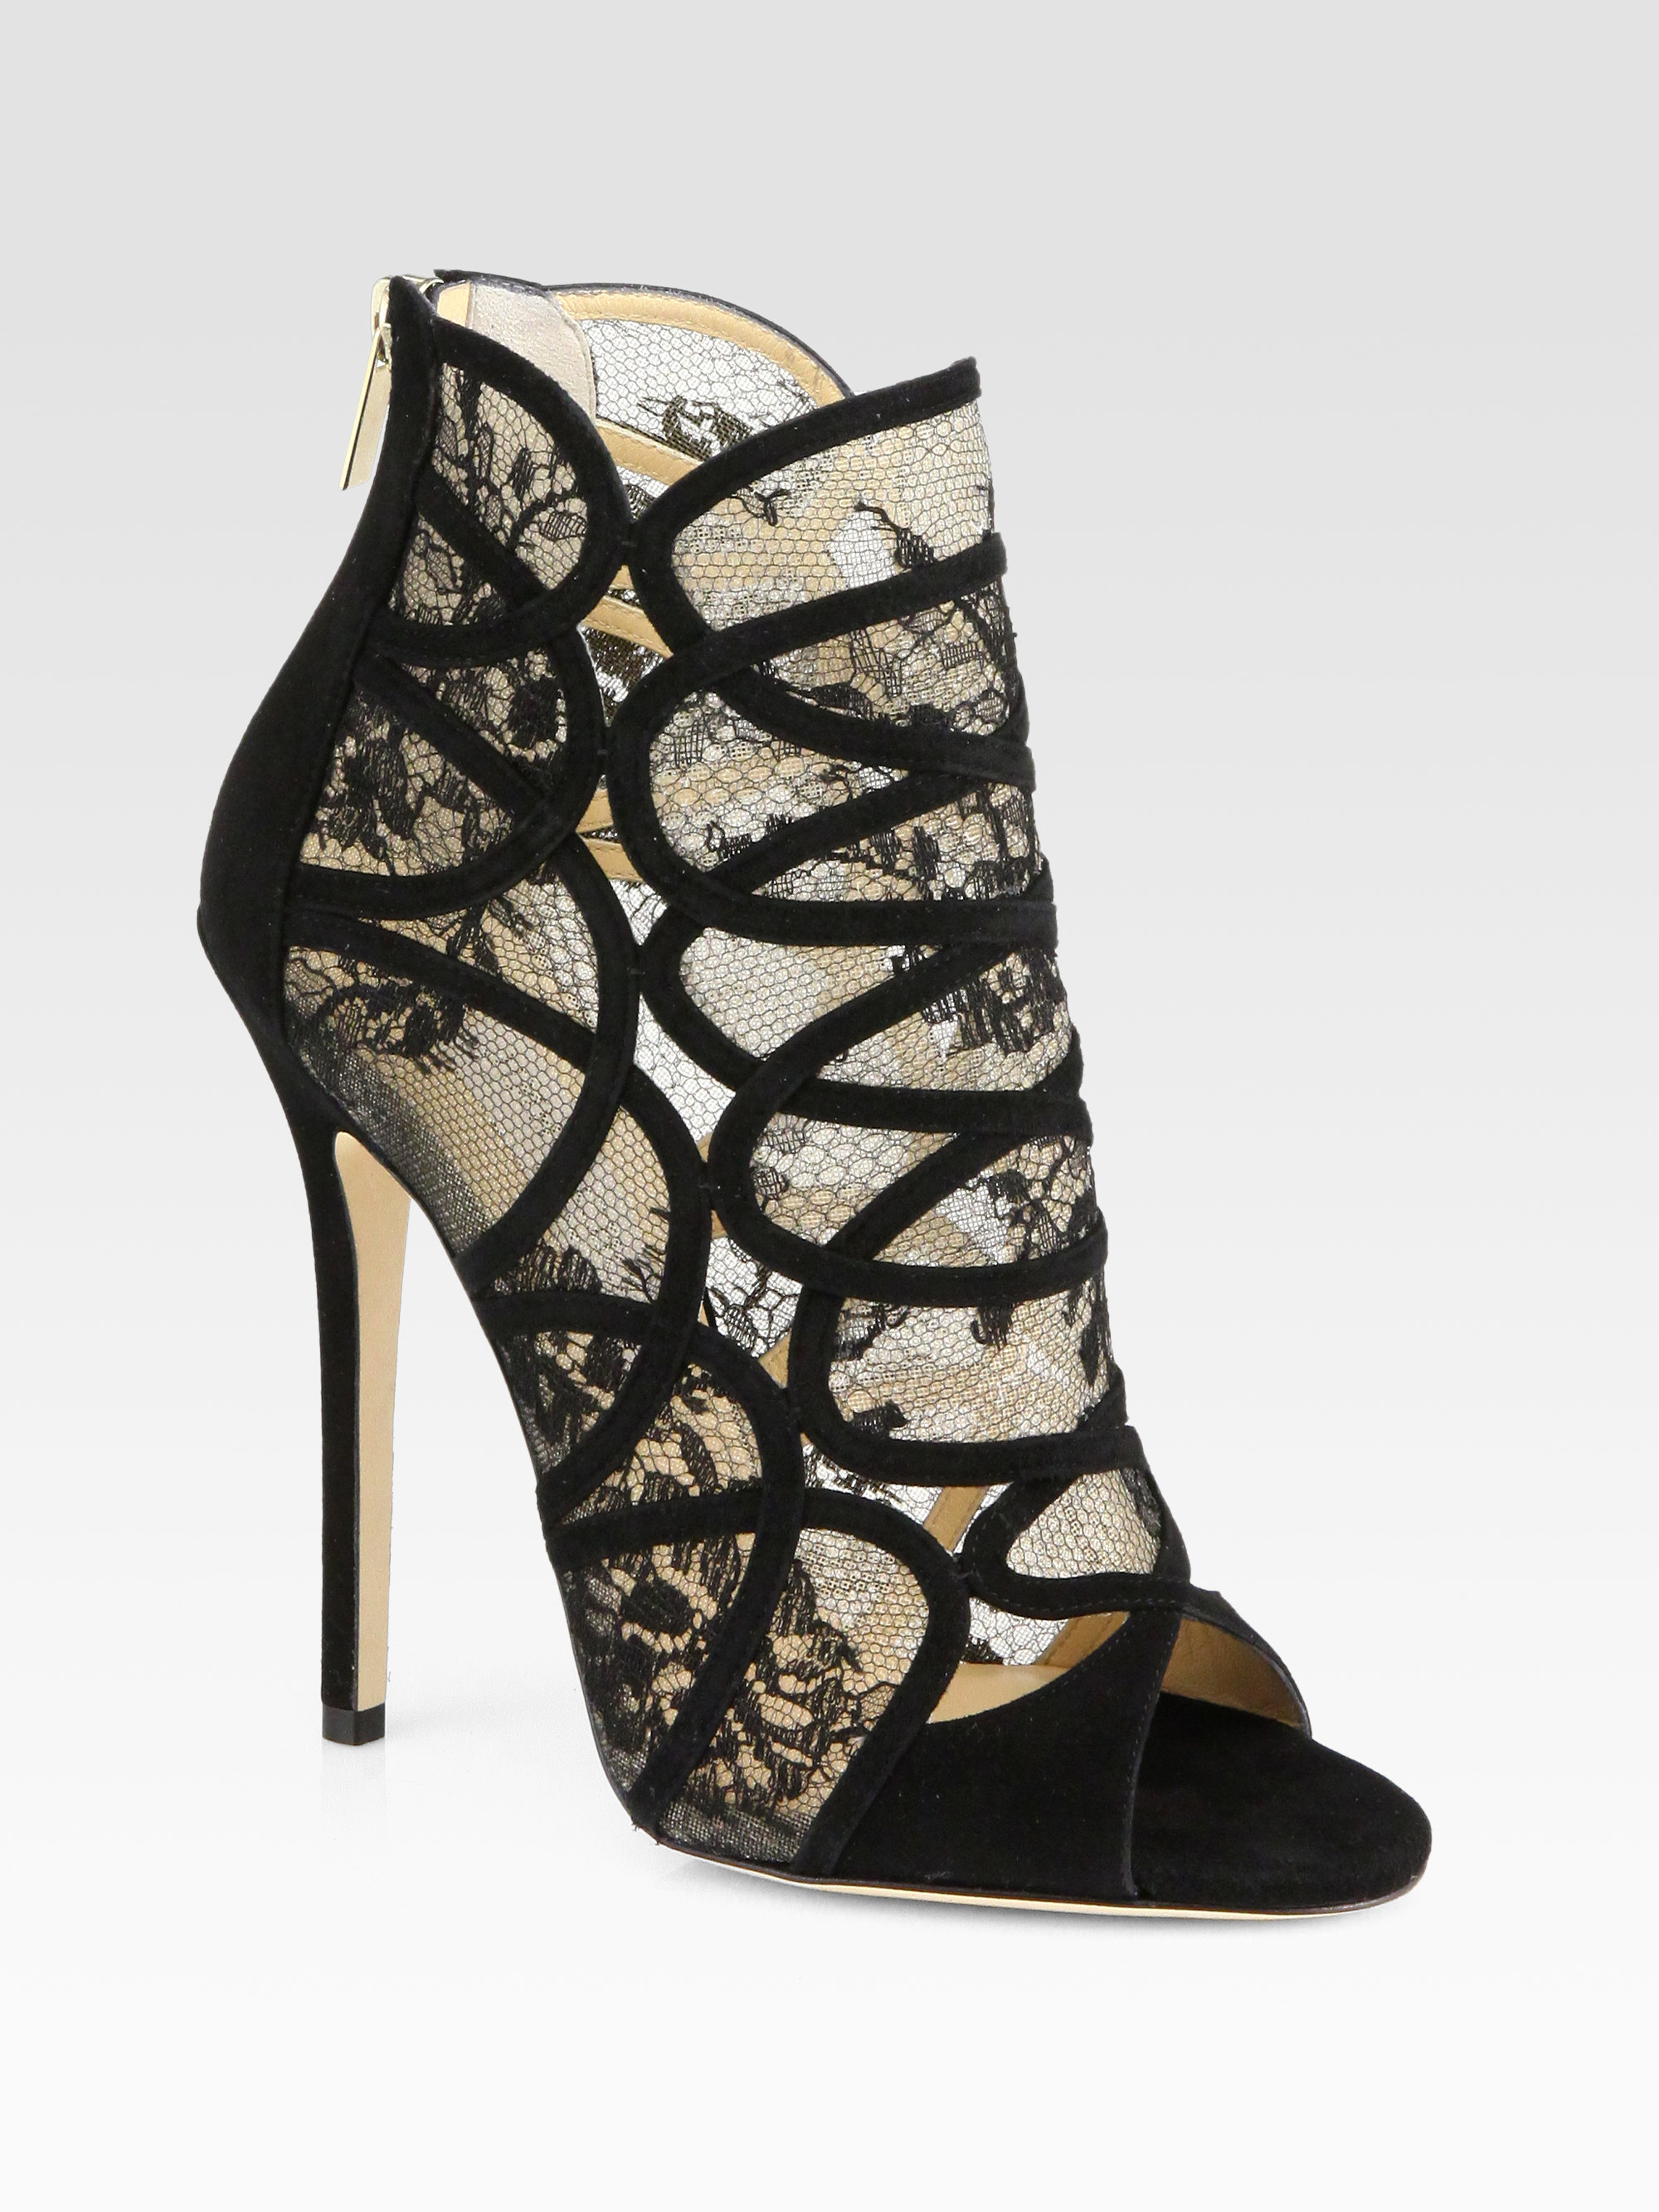 eb15eb183f59 ... buy lyst jimmy choo flaunt lace suede ankle boots in black 47dda f3f68